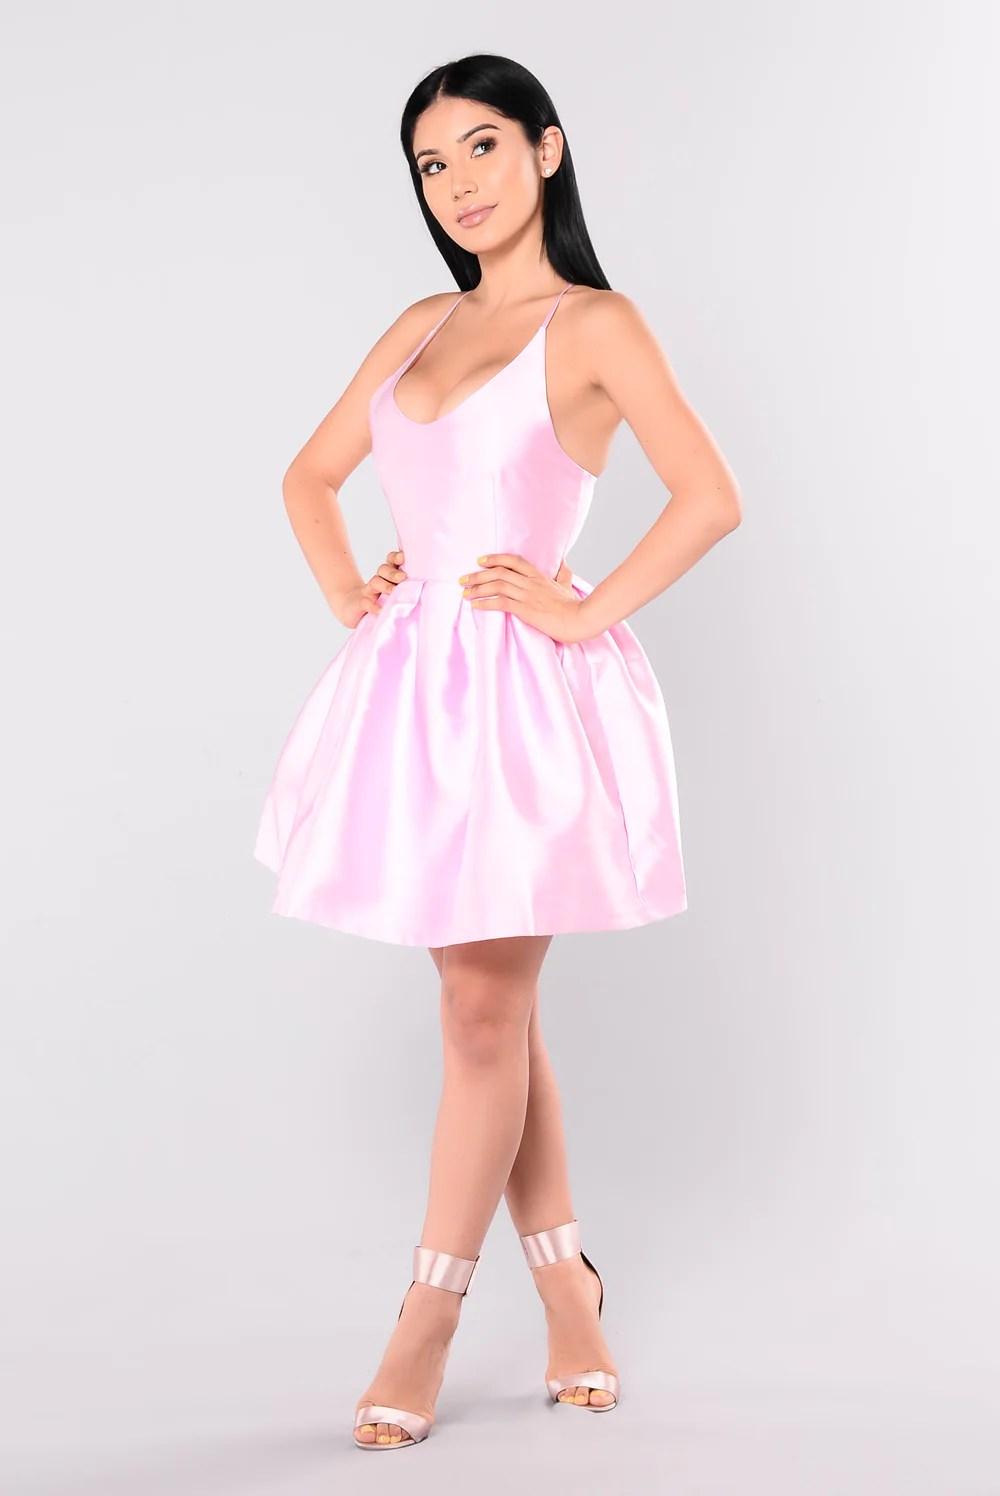 Birthday Party Dress Woman Novocom Top